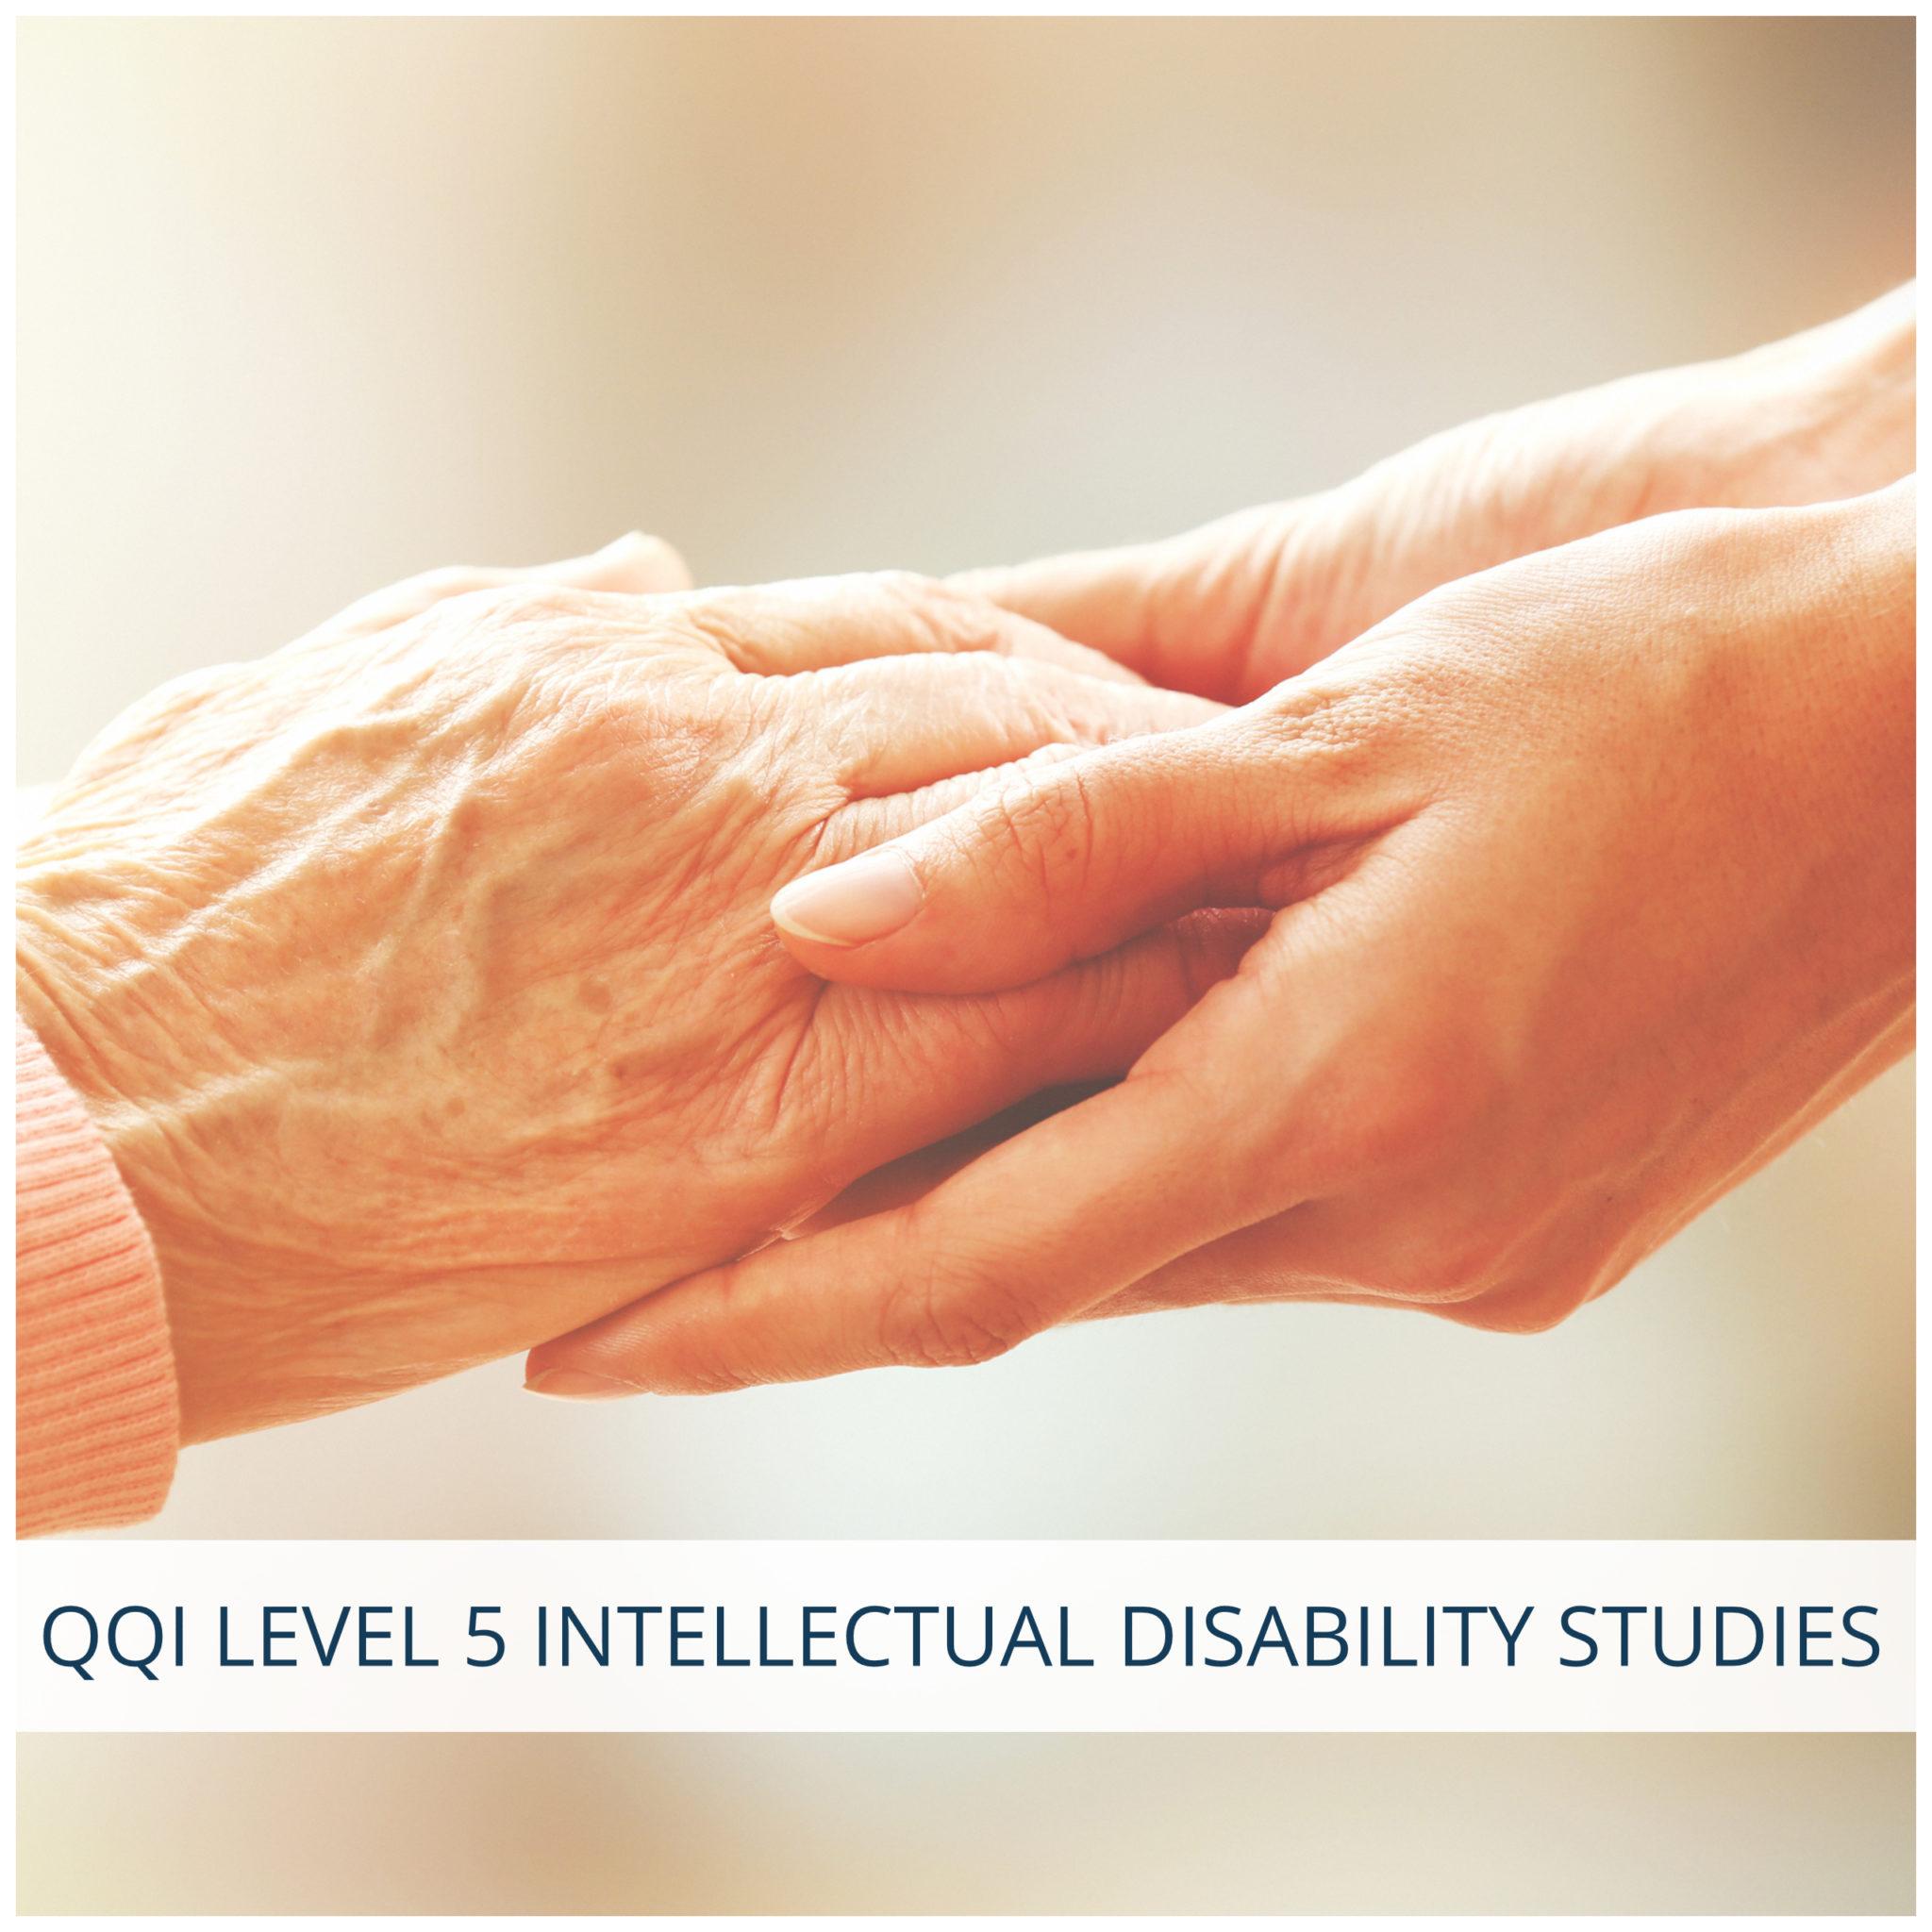 intellectual disability studies